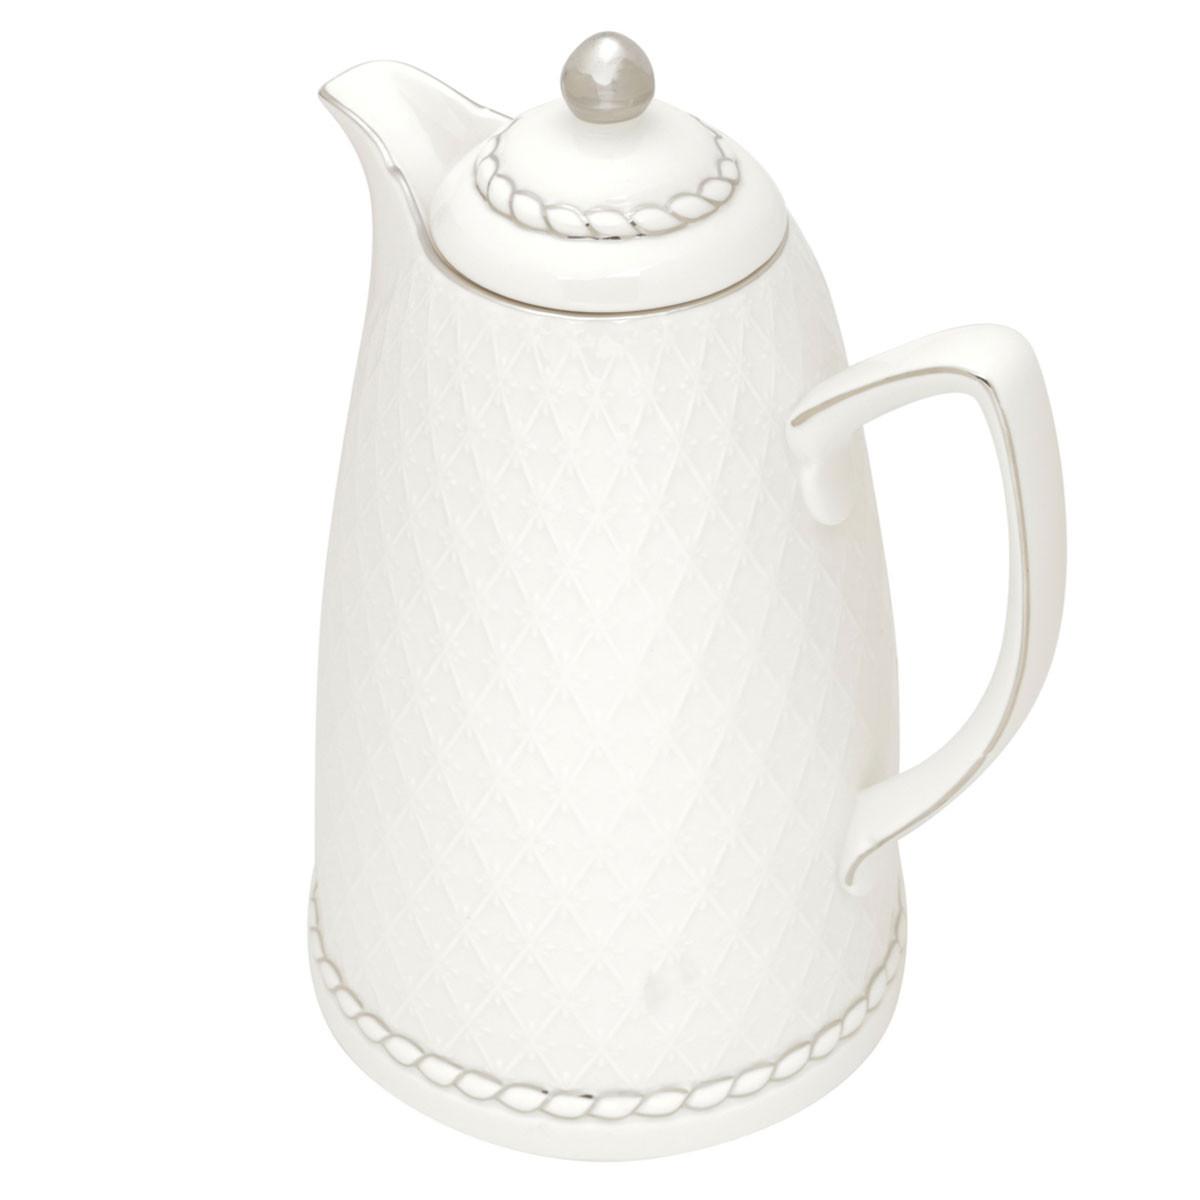 Garrafa Térmica de Porcelana  Renda Branca 28cm - 900ml